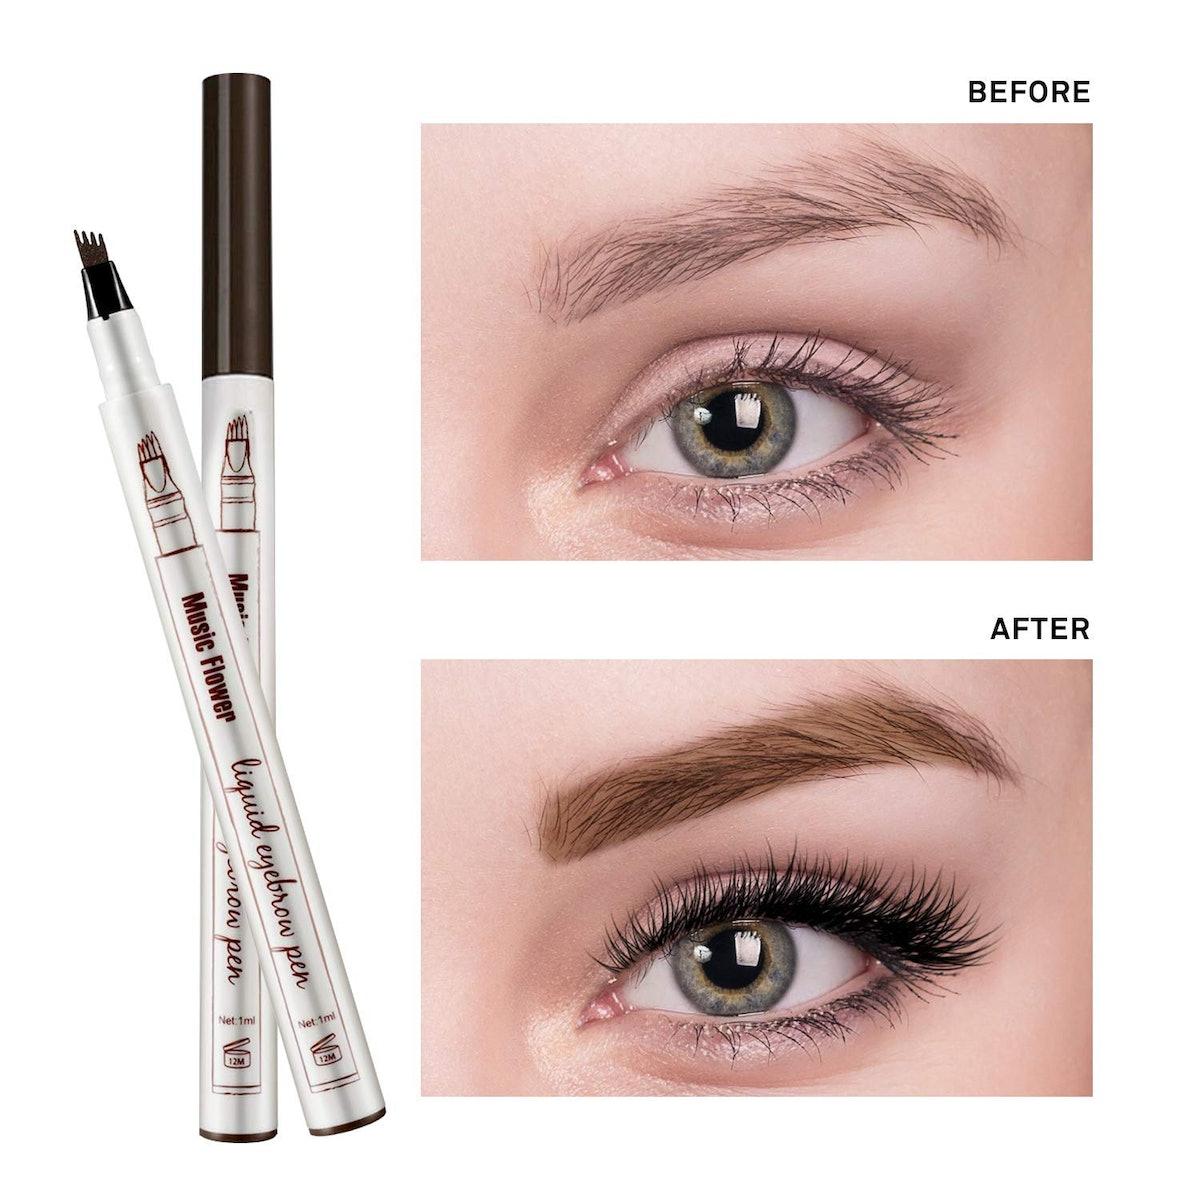 AsaVea Tattoo Eyebrow Pen